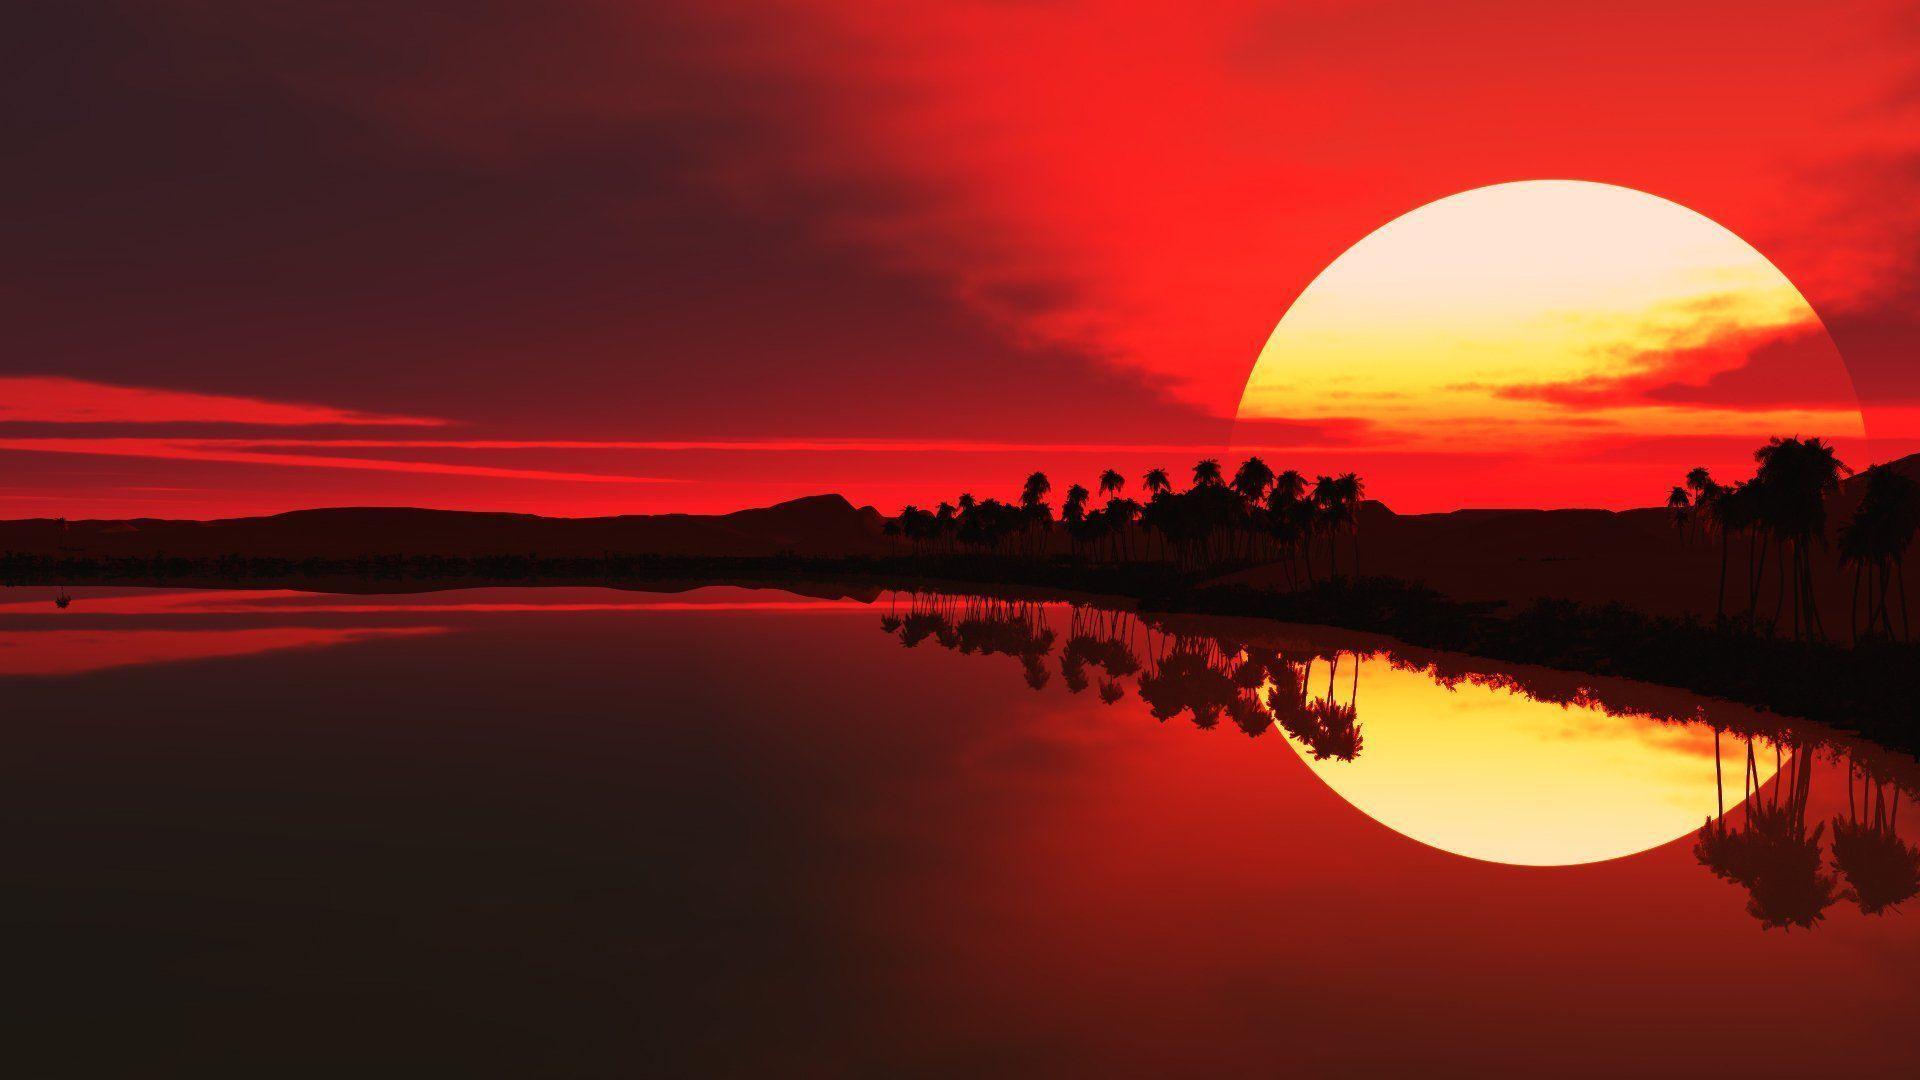 amazing hd sunset | HD Wallpapers